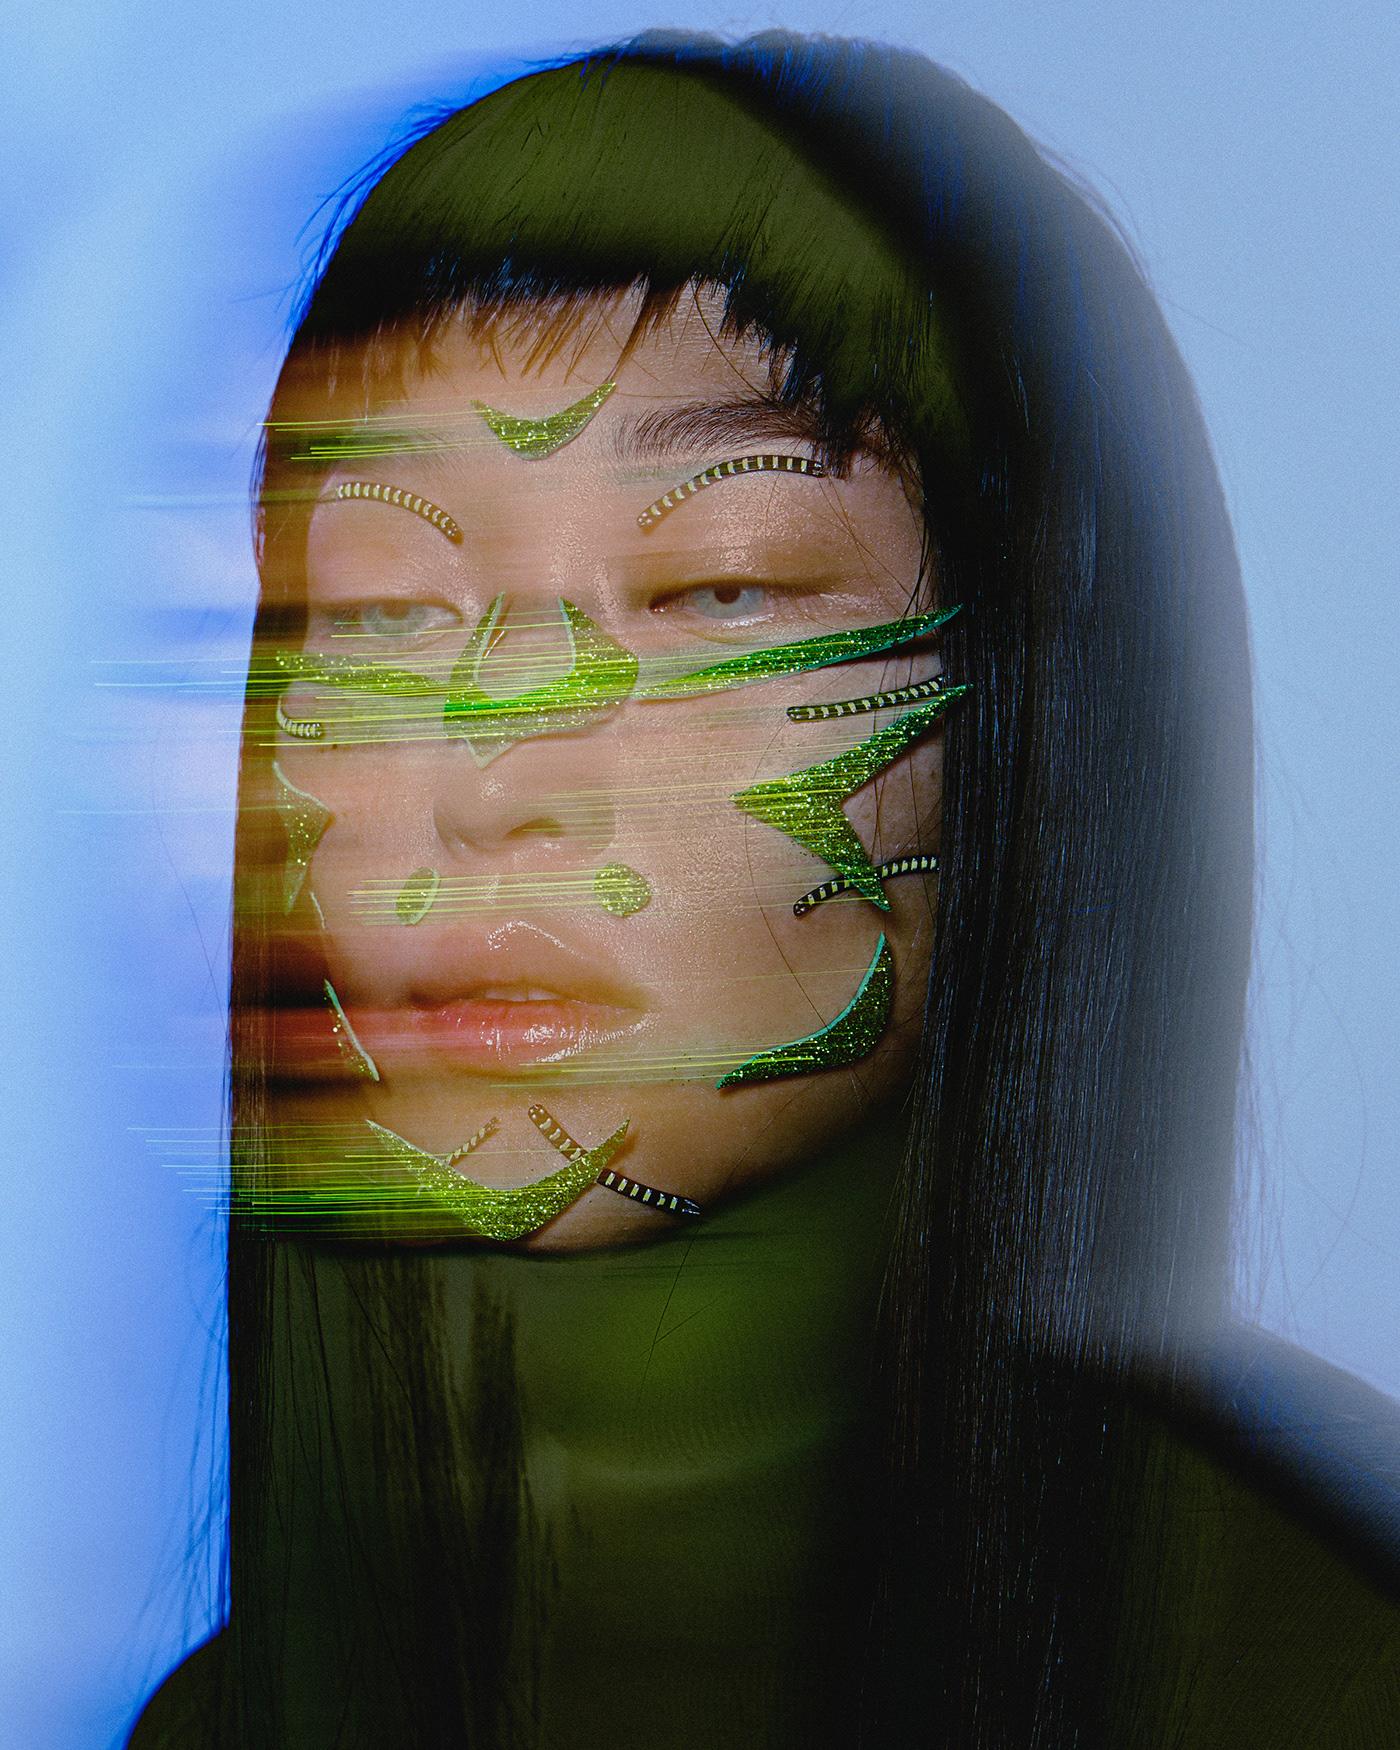 Image may contain: human face, face and eyes